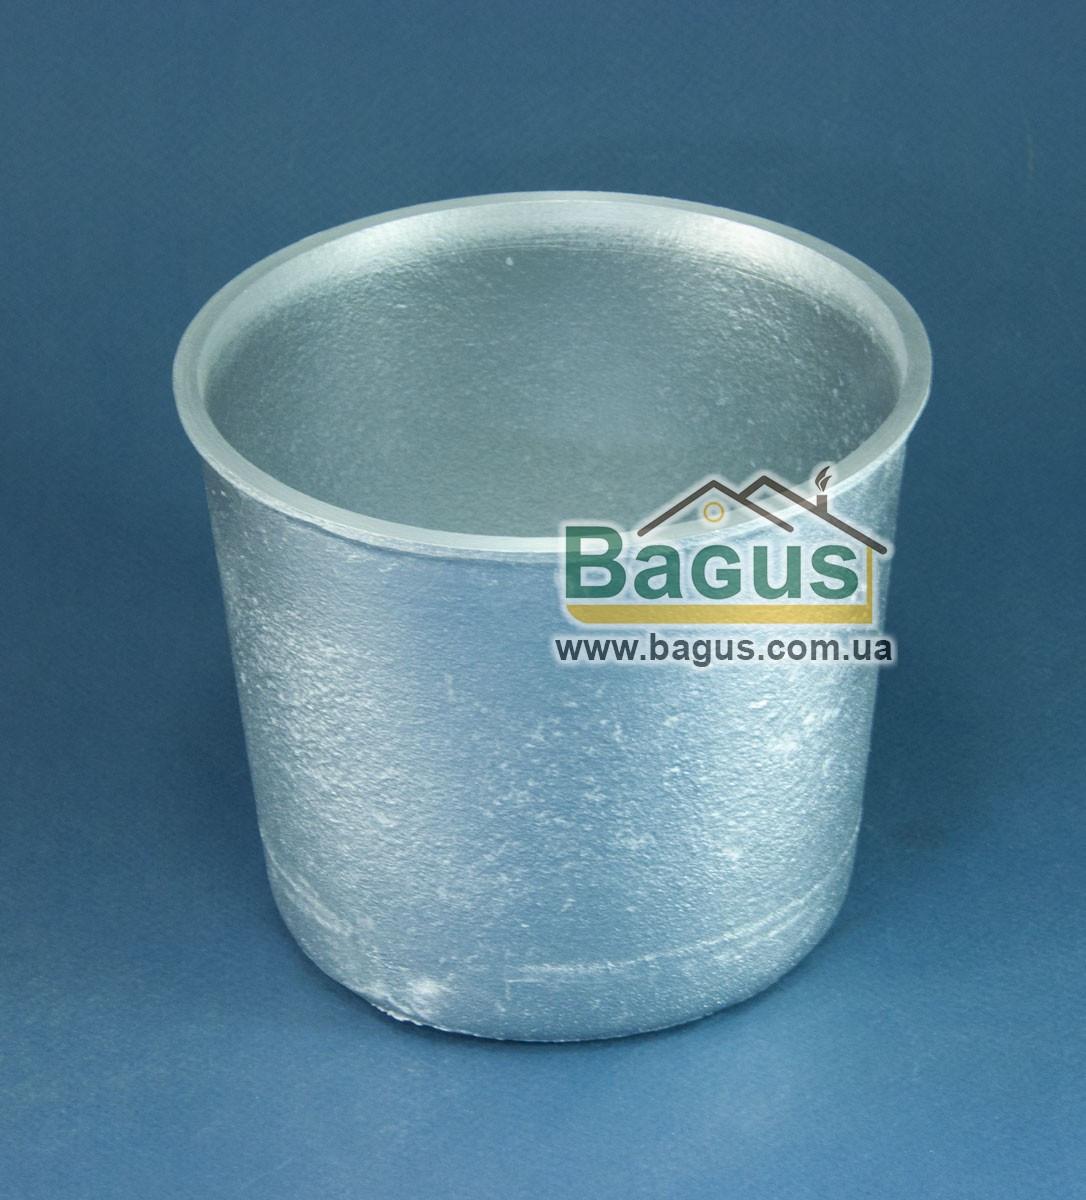 Форма алюминиевая для выпечки кулича (паски) 1,0л ПРОЛИС (ФПК-002)